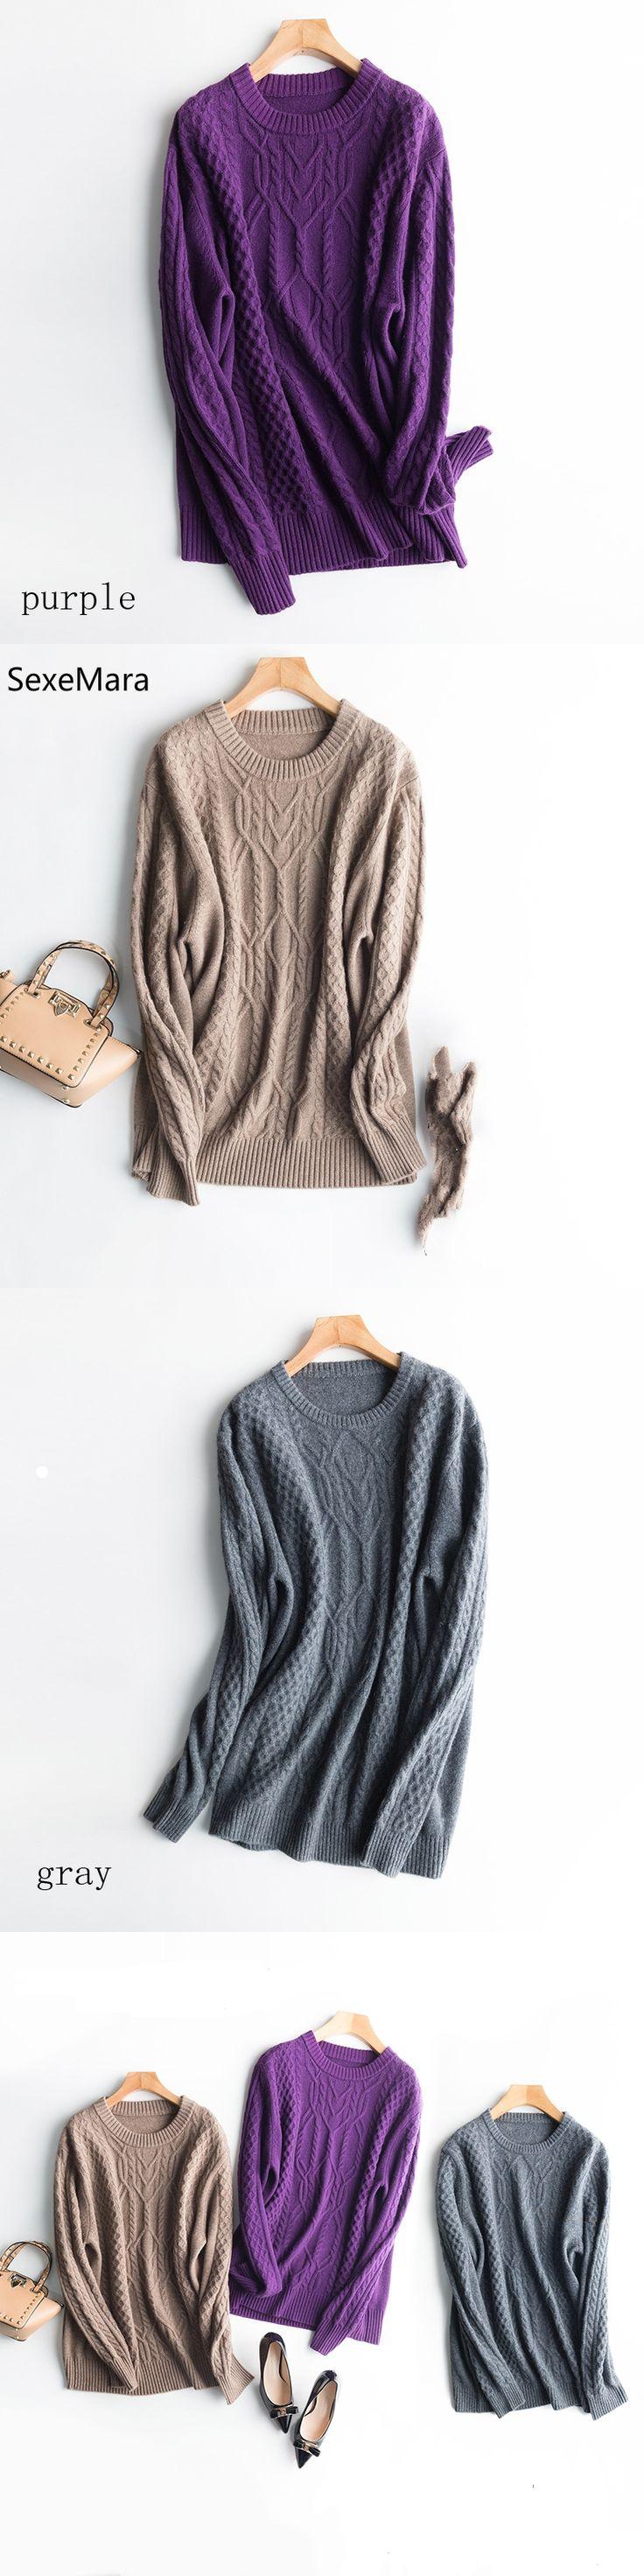 SexeMara Men's  Cashmere Sweaters Casual Winter O-neck Collar Diamond Block Plaid Aregle Cashmere Sweater